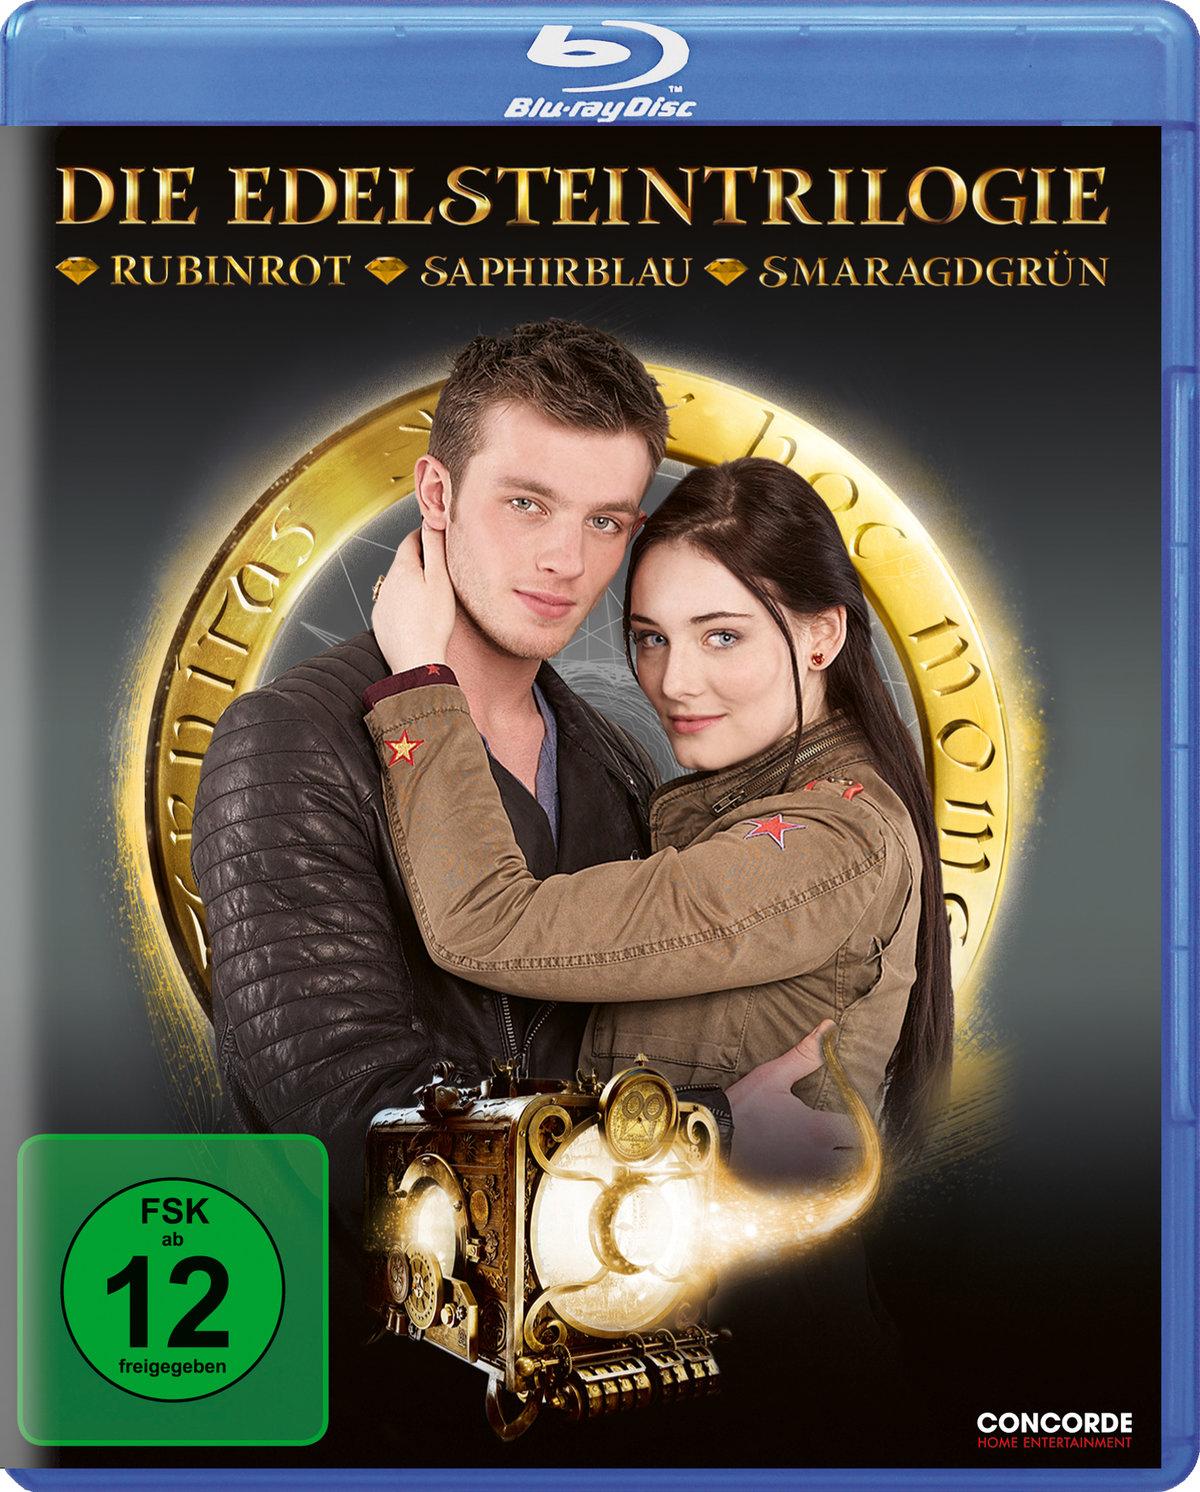 Die Edelsteintrilogie - Rubinrot / Saphirblau / Smaragdgrün (4 Blu-rays)